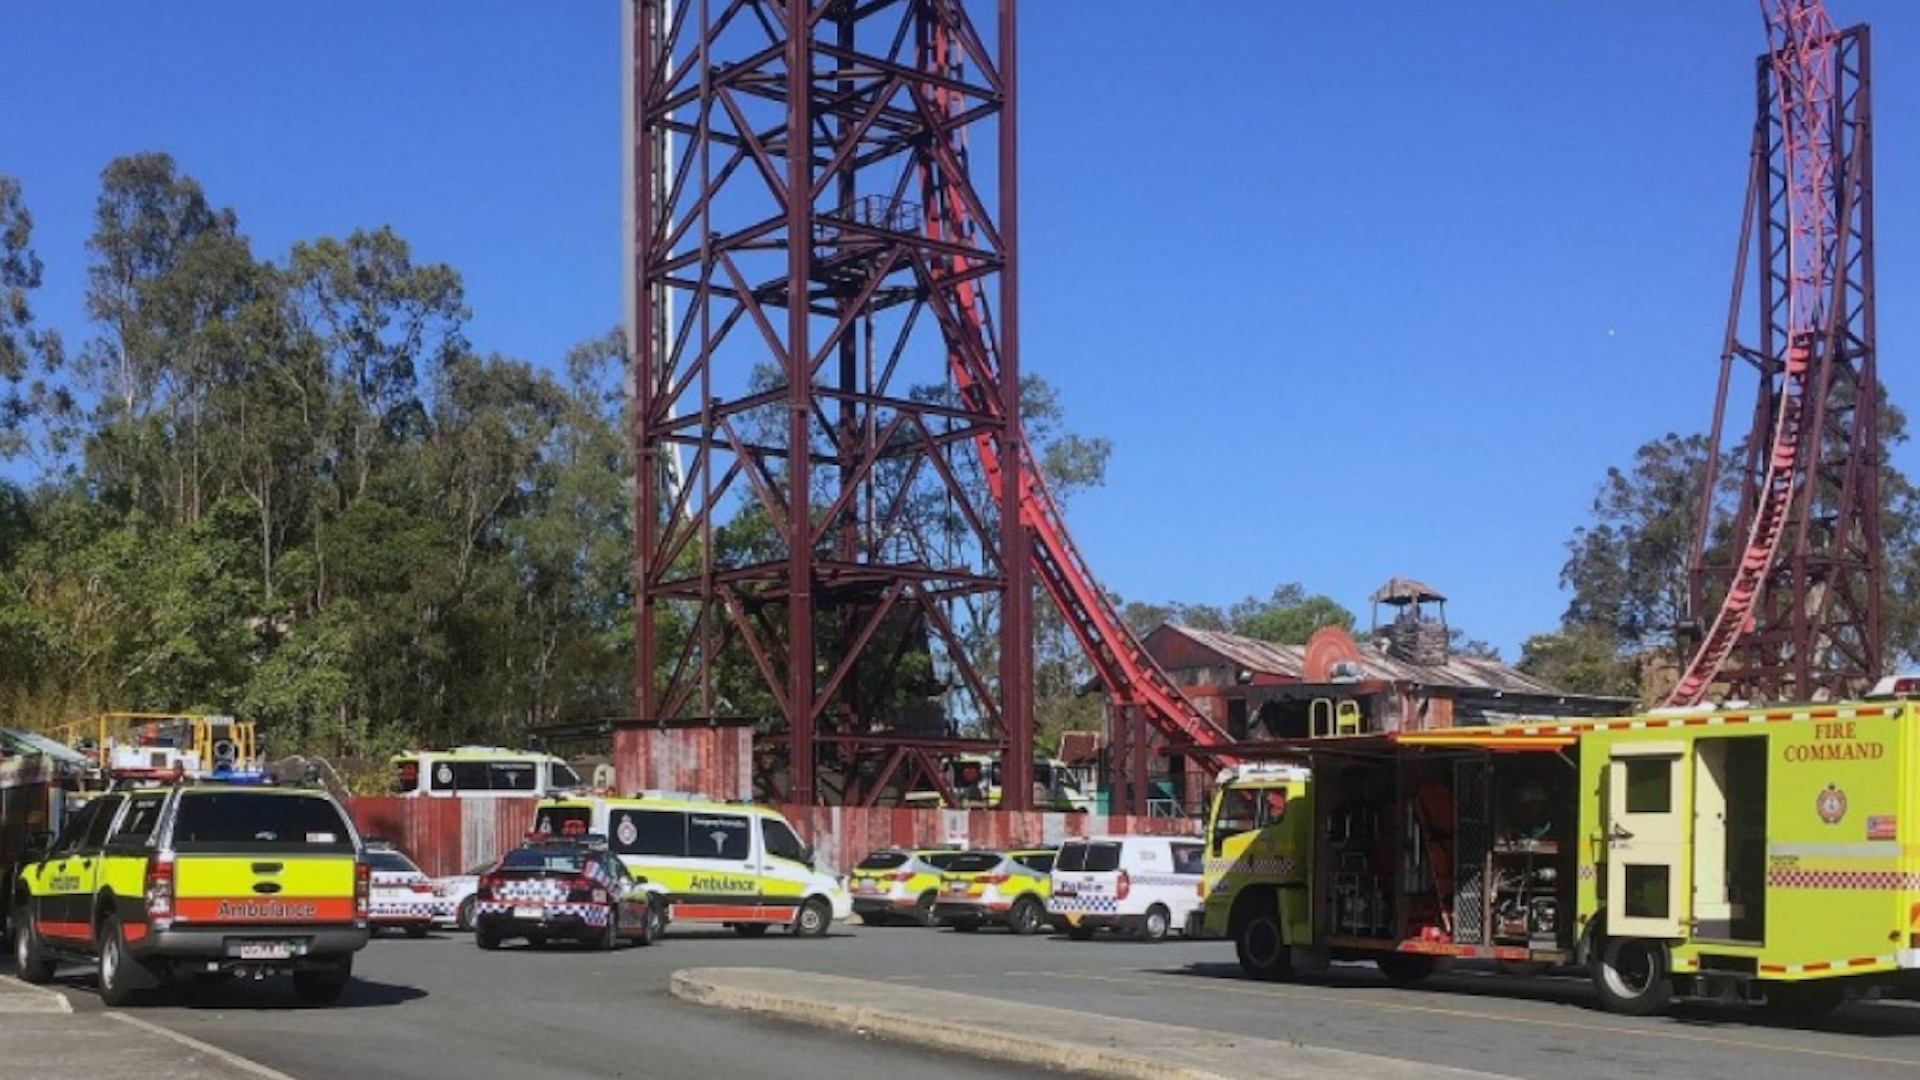 River ride malfunction at Australia's Dreamworld kills four people, horrifies onlookers